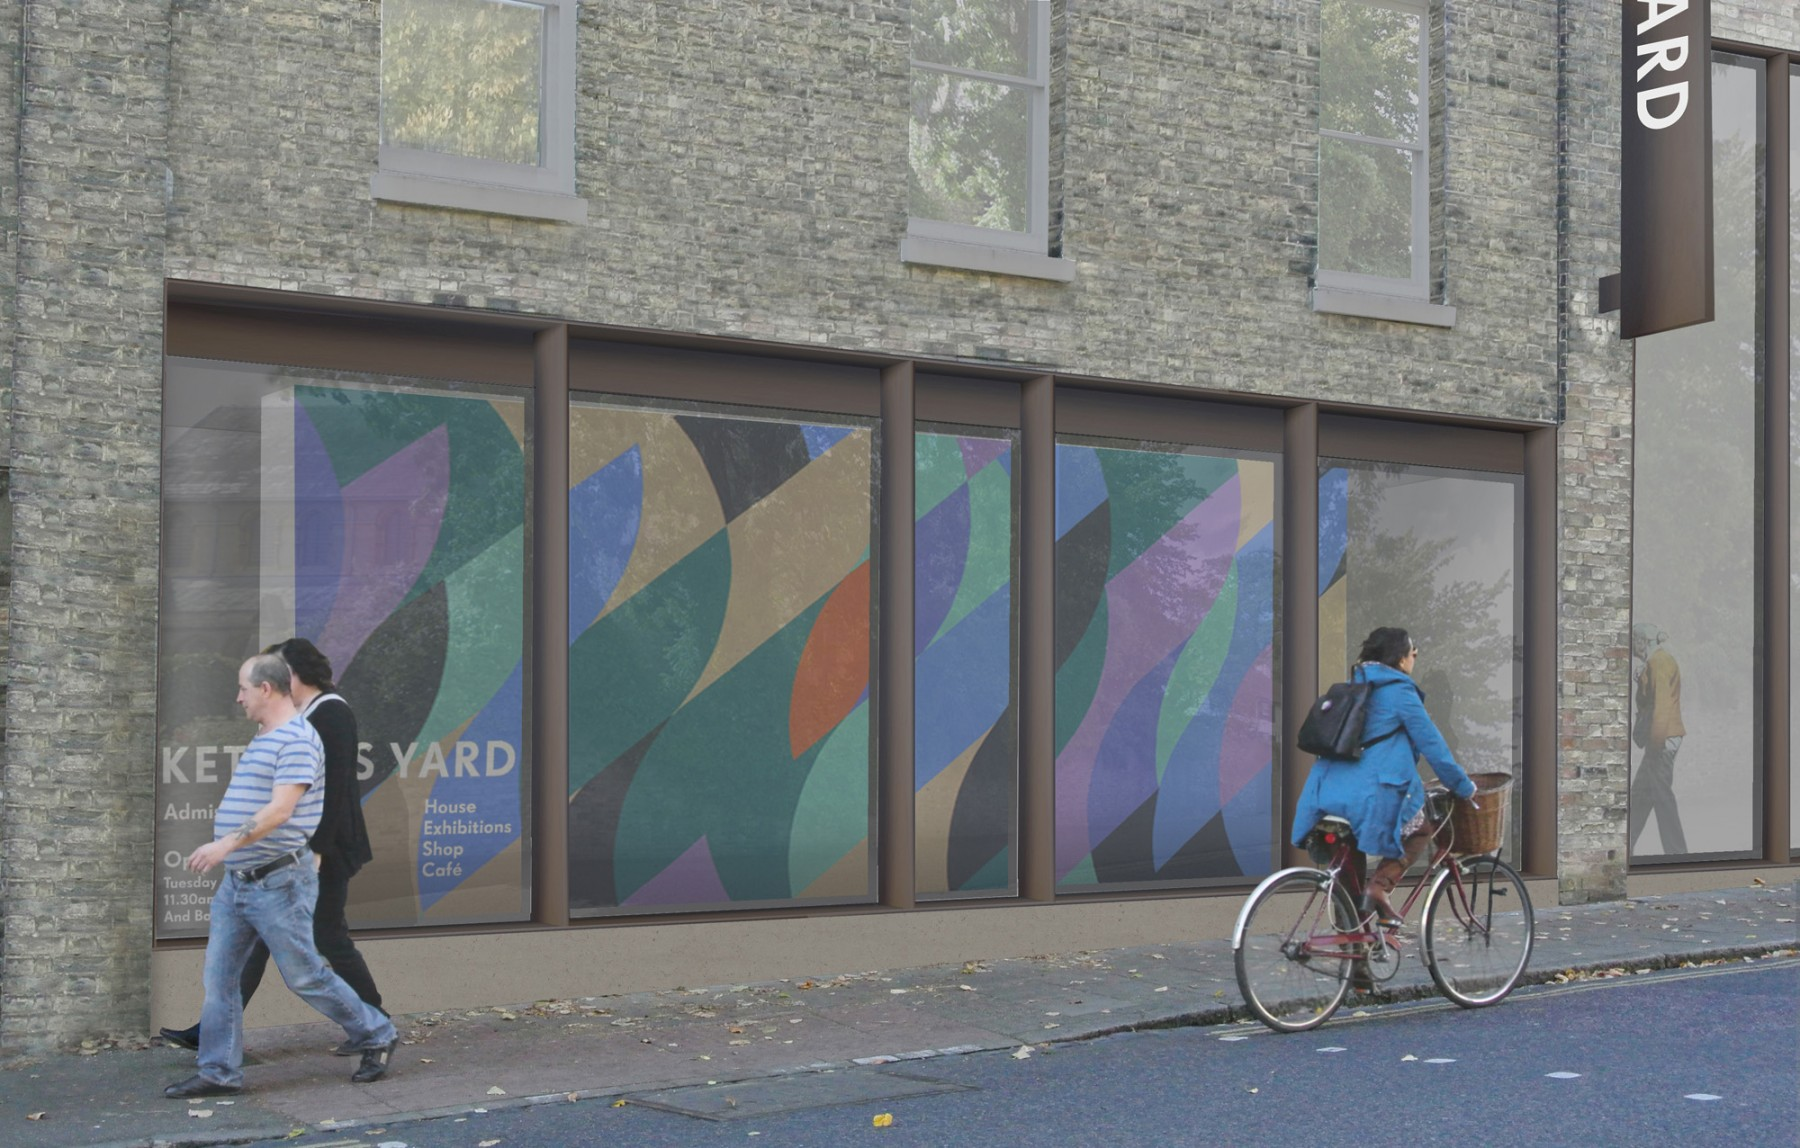 Kettles-yard-jamie-fobert-architects-castle-street-cambridge-gallery-view